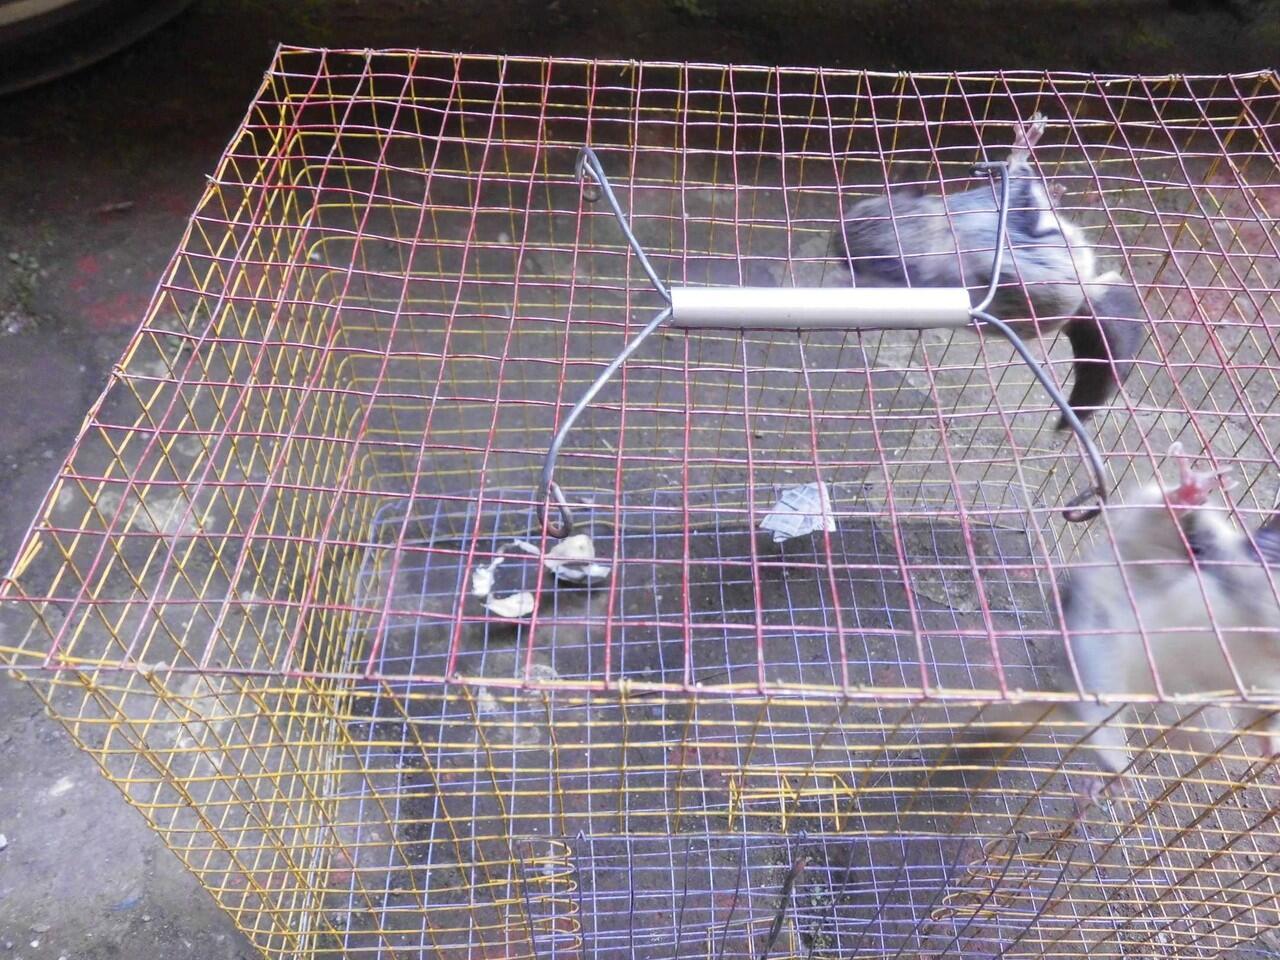 Tupai Terbang Jawa A.K.A Javanese Flying Squirrel